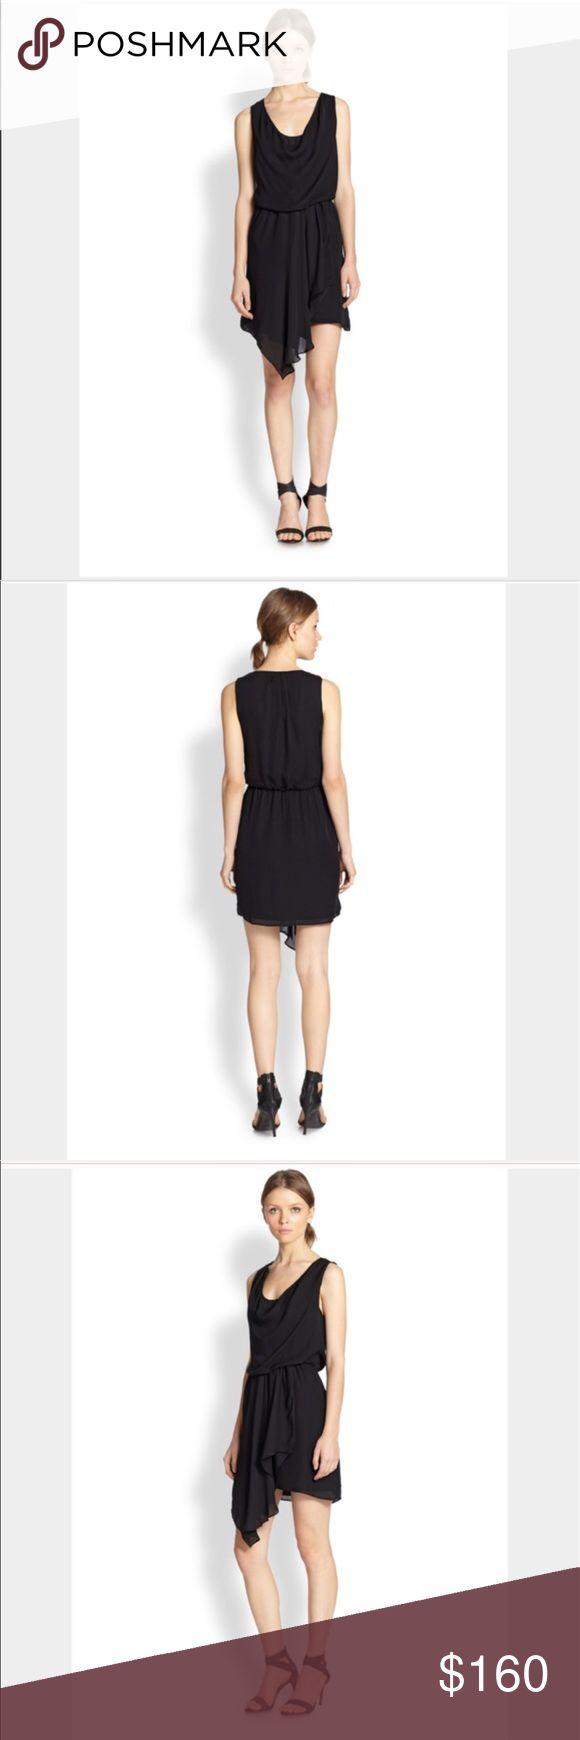 Joie black silk dress- NWT- size small Joie black silk dress- NWT- size small. A cowl neckline and draped skirt give this Joie dress a soft, graceful look. Gathered elastic waist. Lined. Fabric: silk chiffon. Shell: 100% silk. Stunning! Joie Dresses